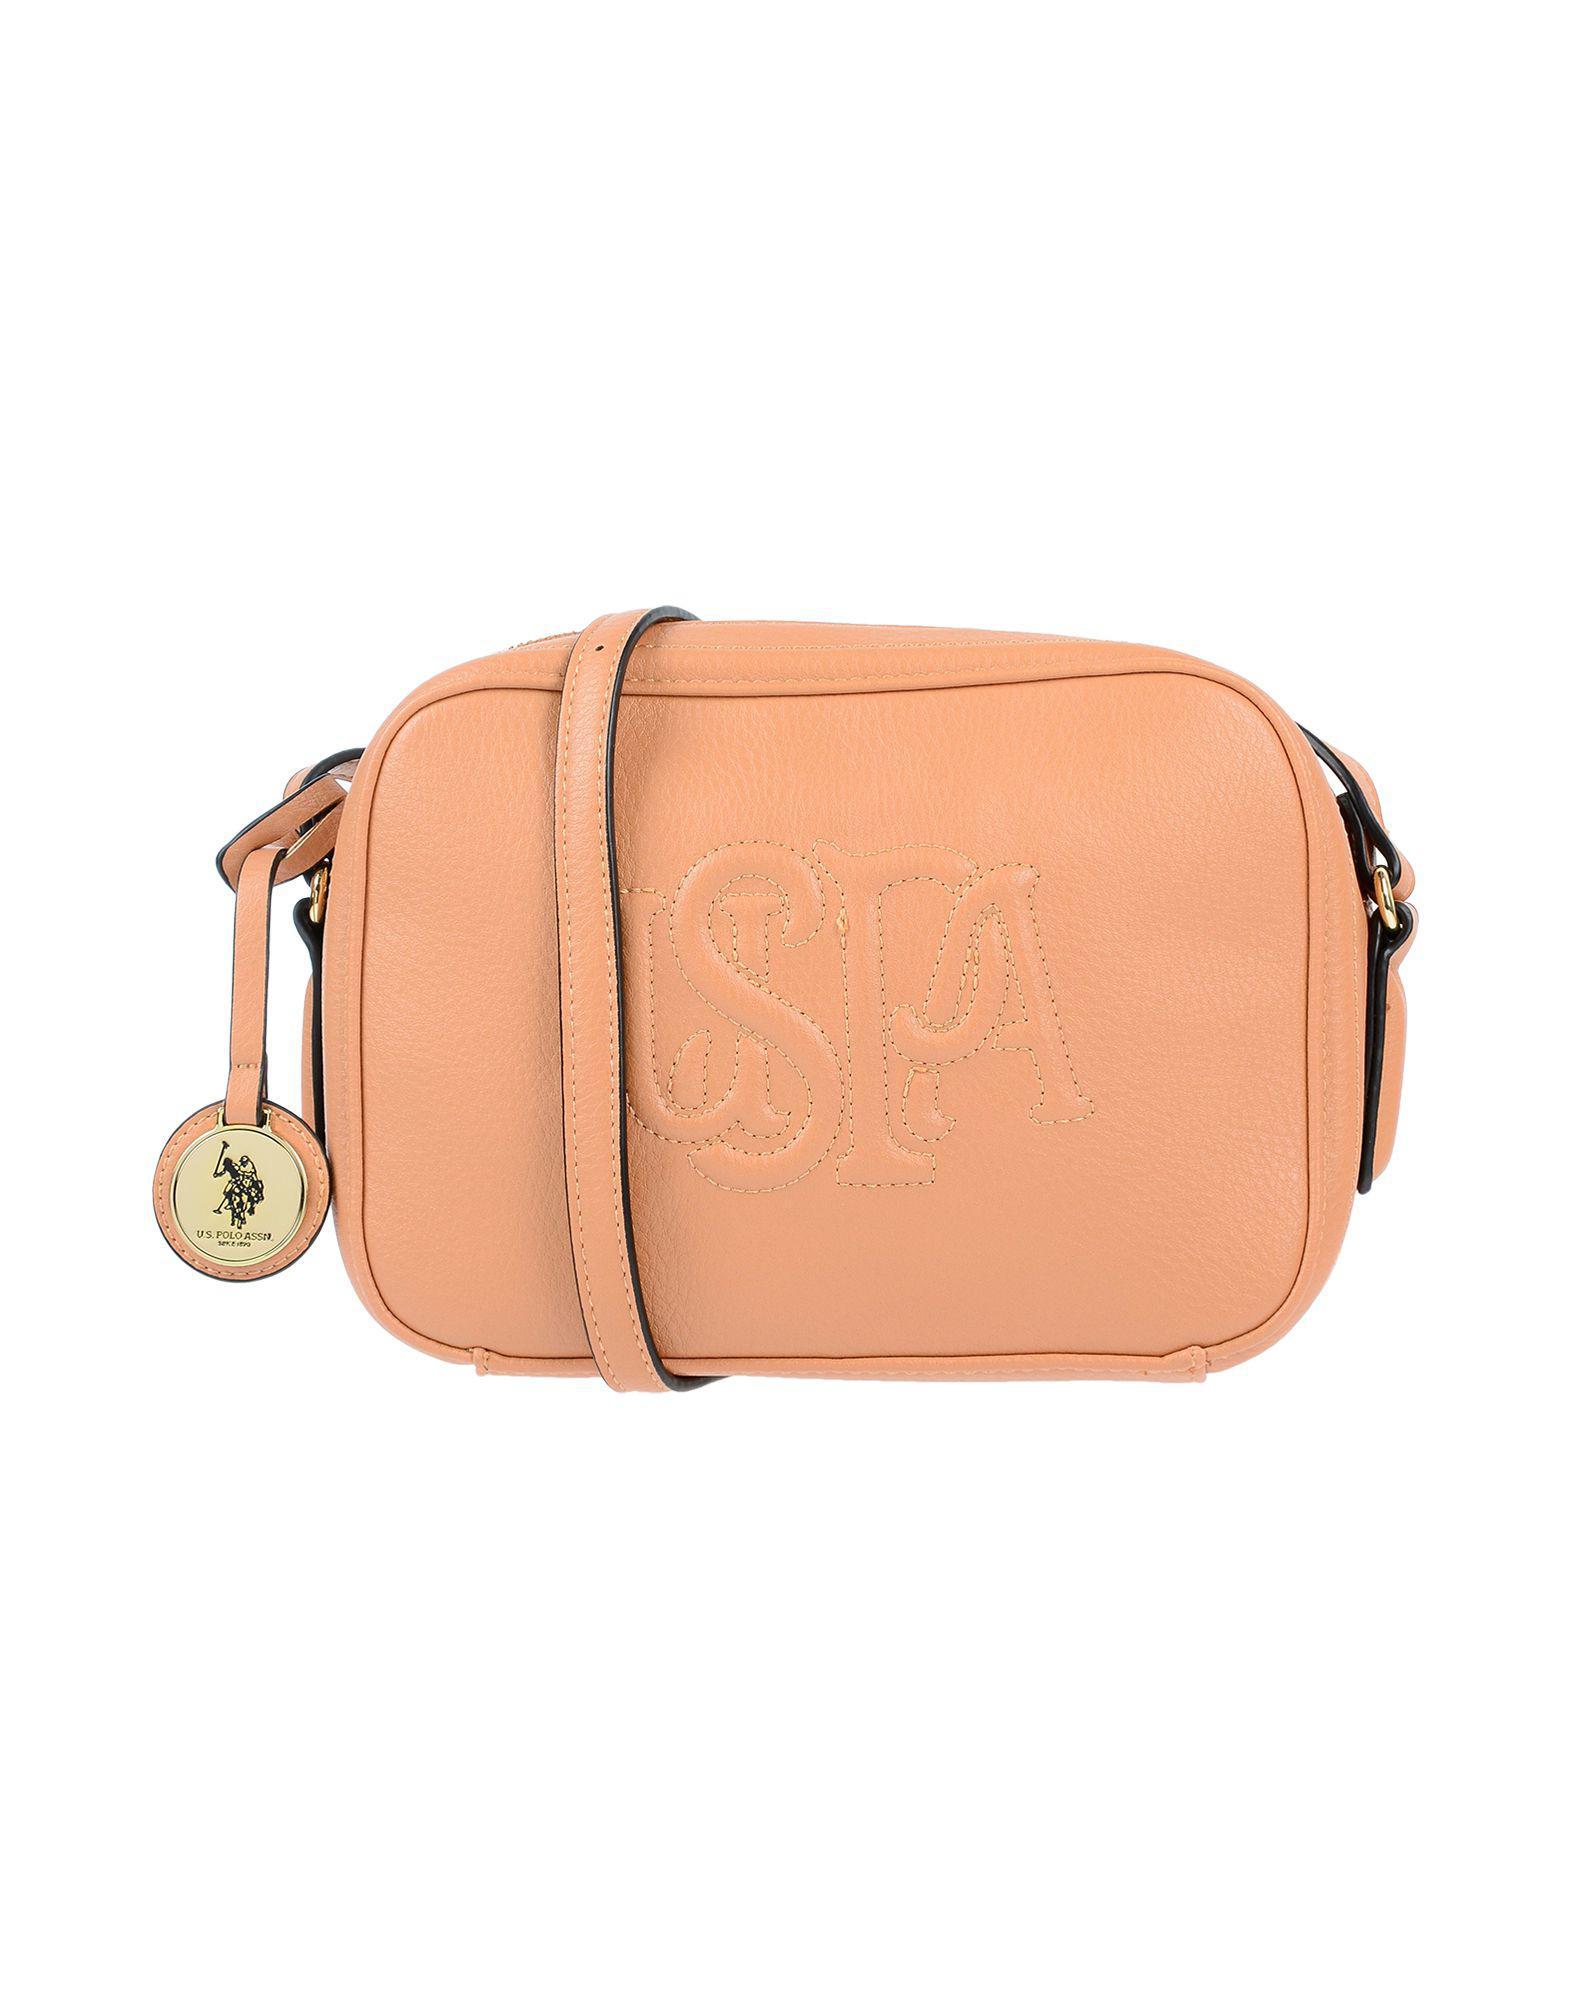 14c6835a0186 U.S. POLO ASSN. Cross-body Bag in Brown - Lyst